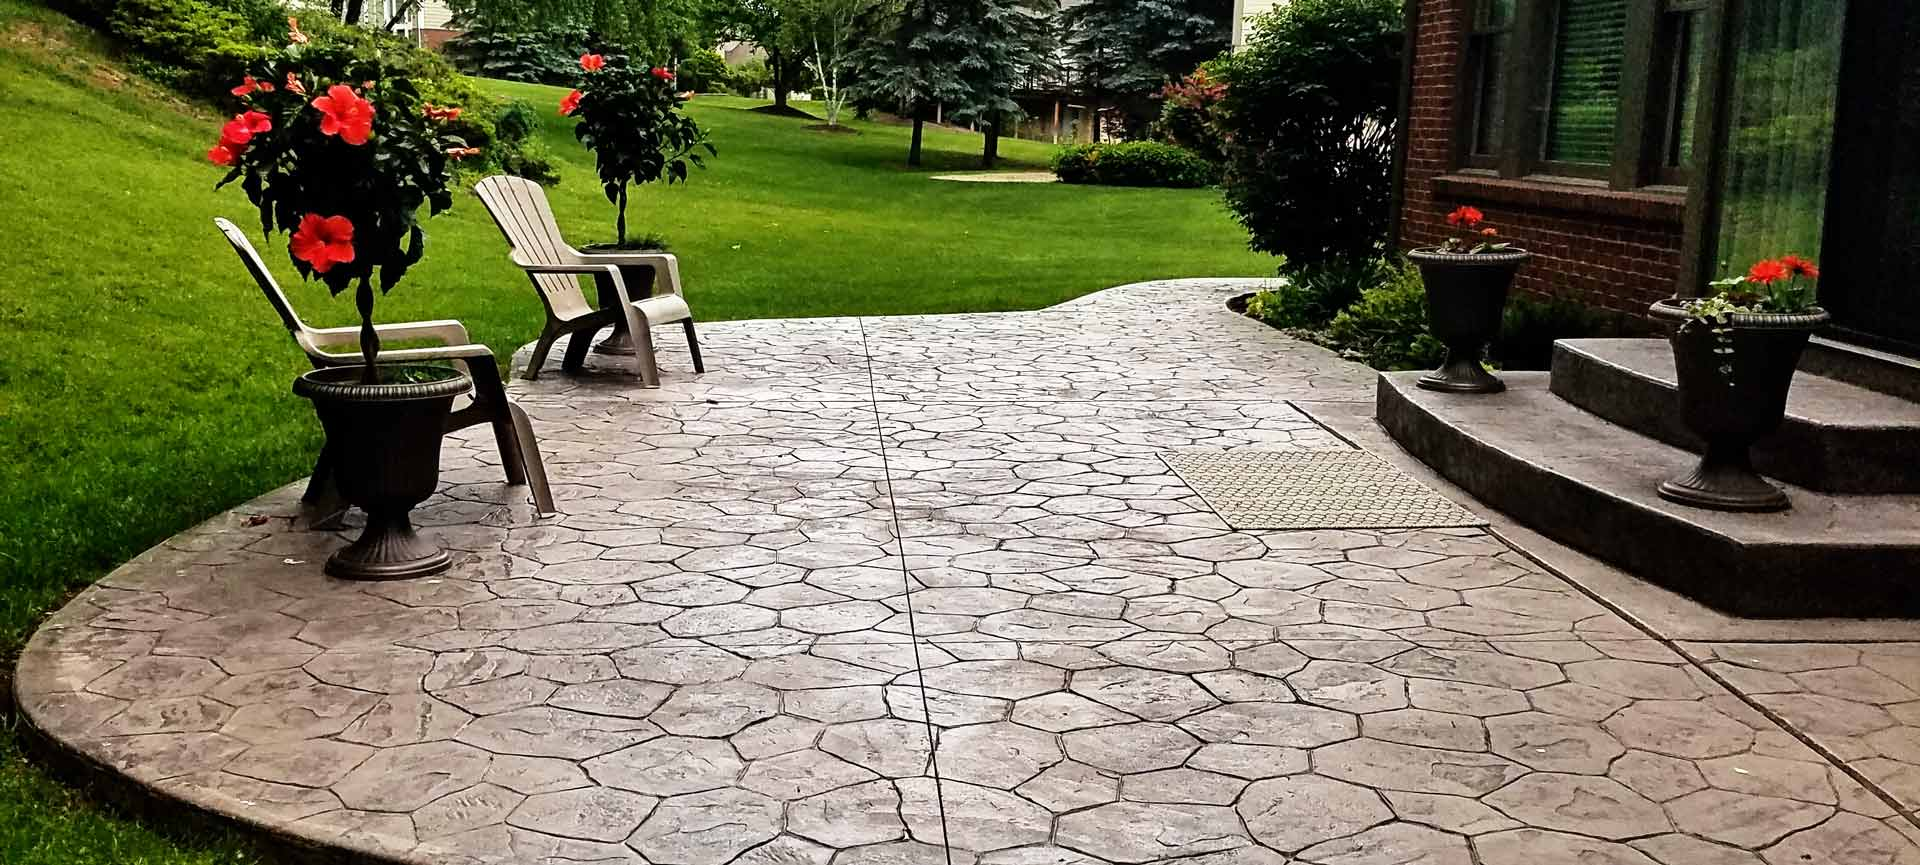 Patios - Concrete Contractor Michigan | Reliable Custom Concrete